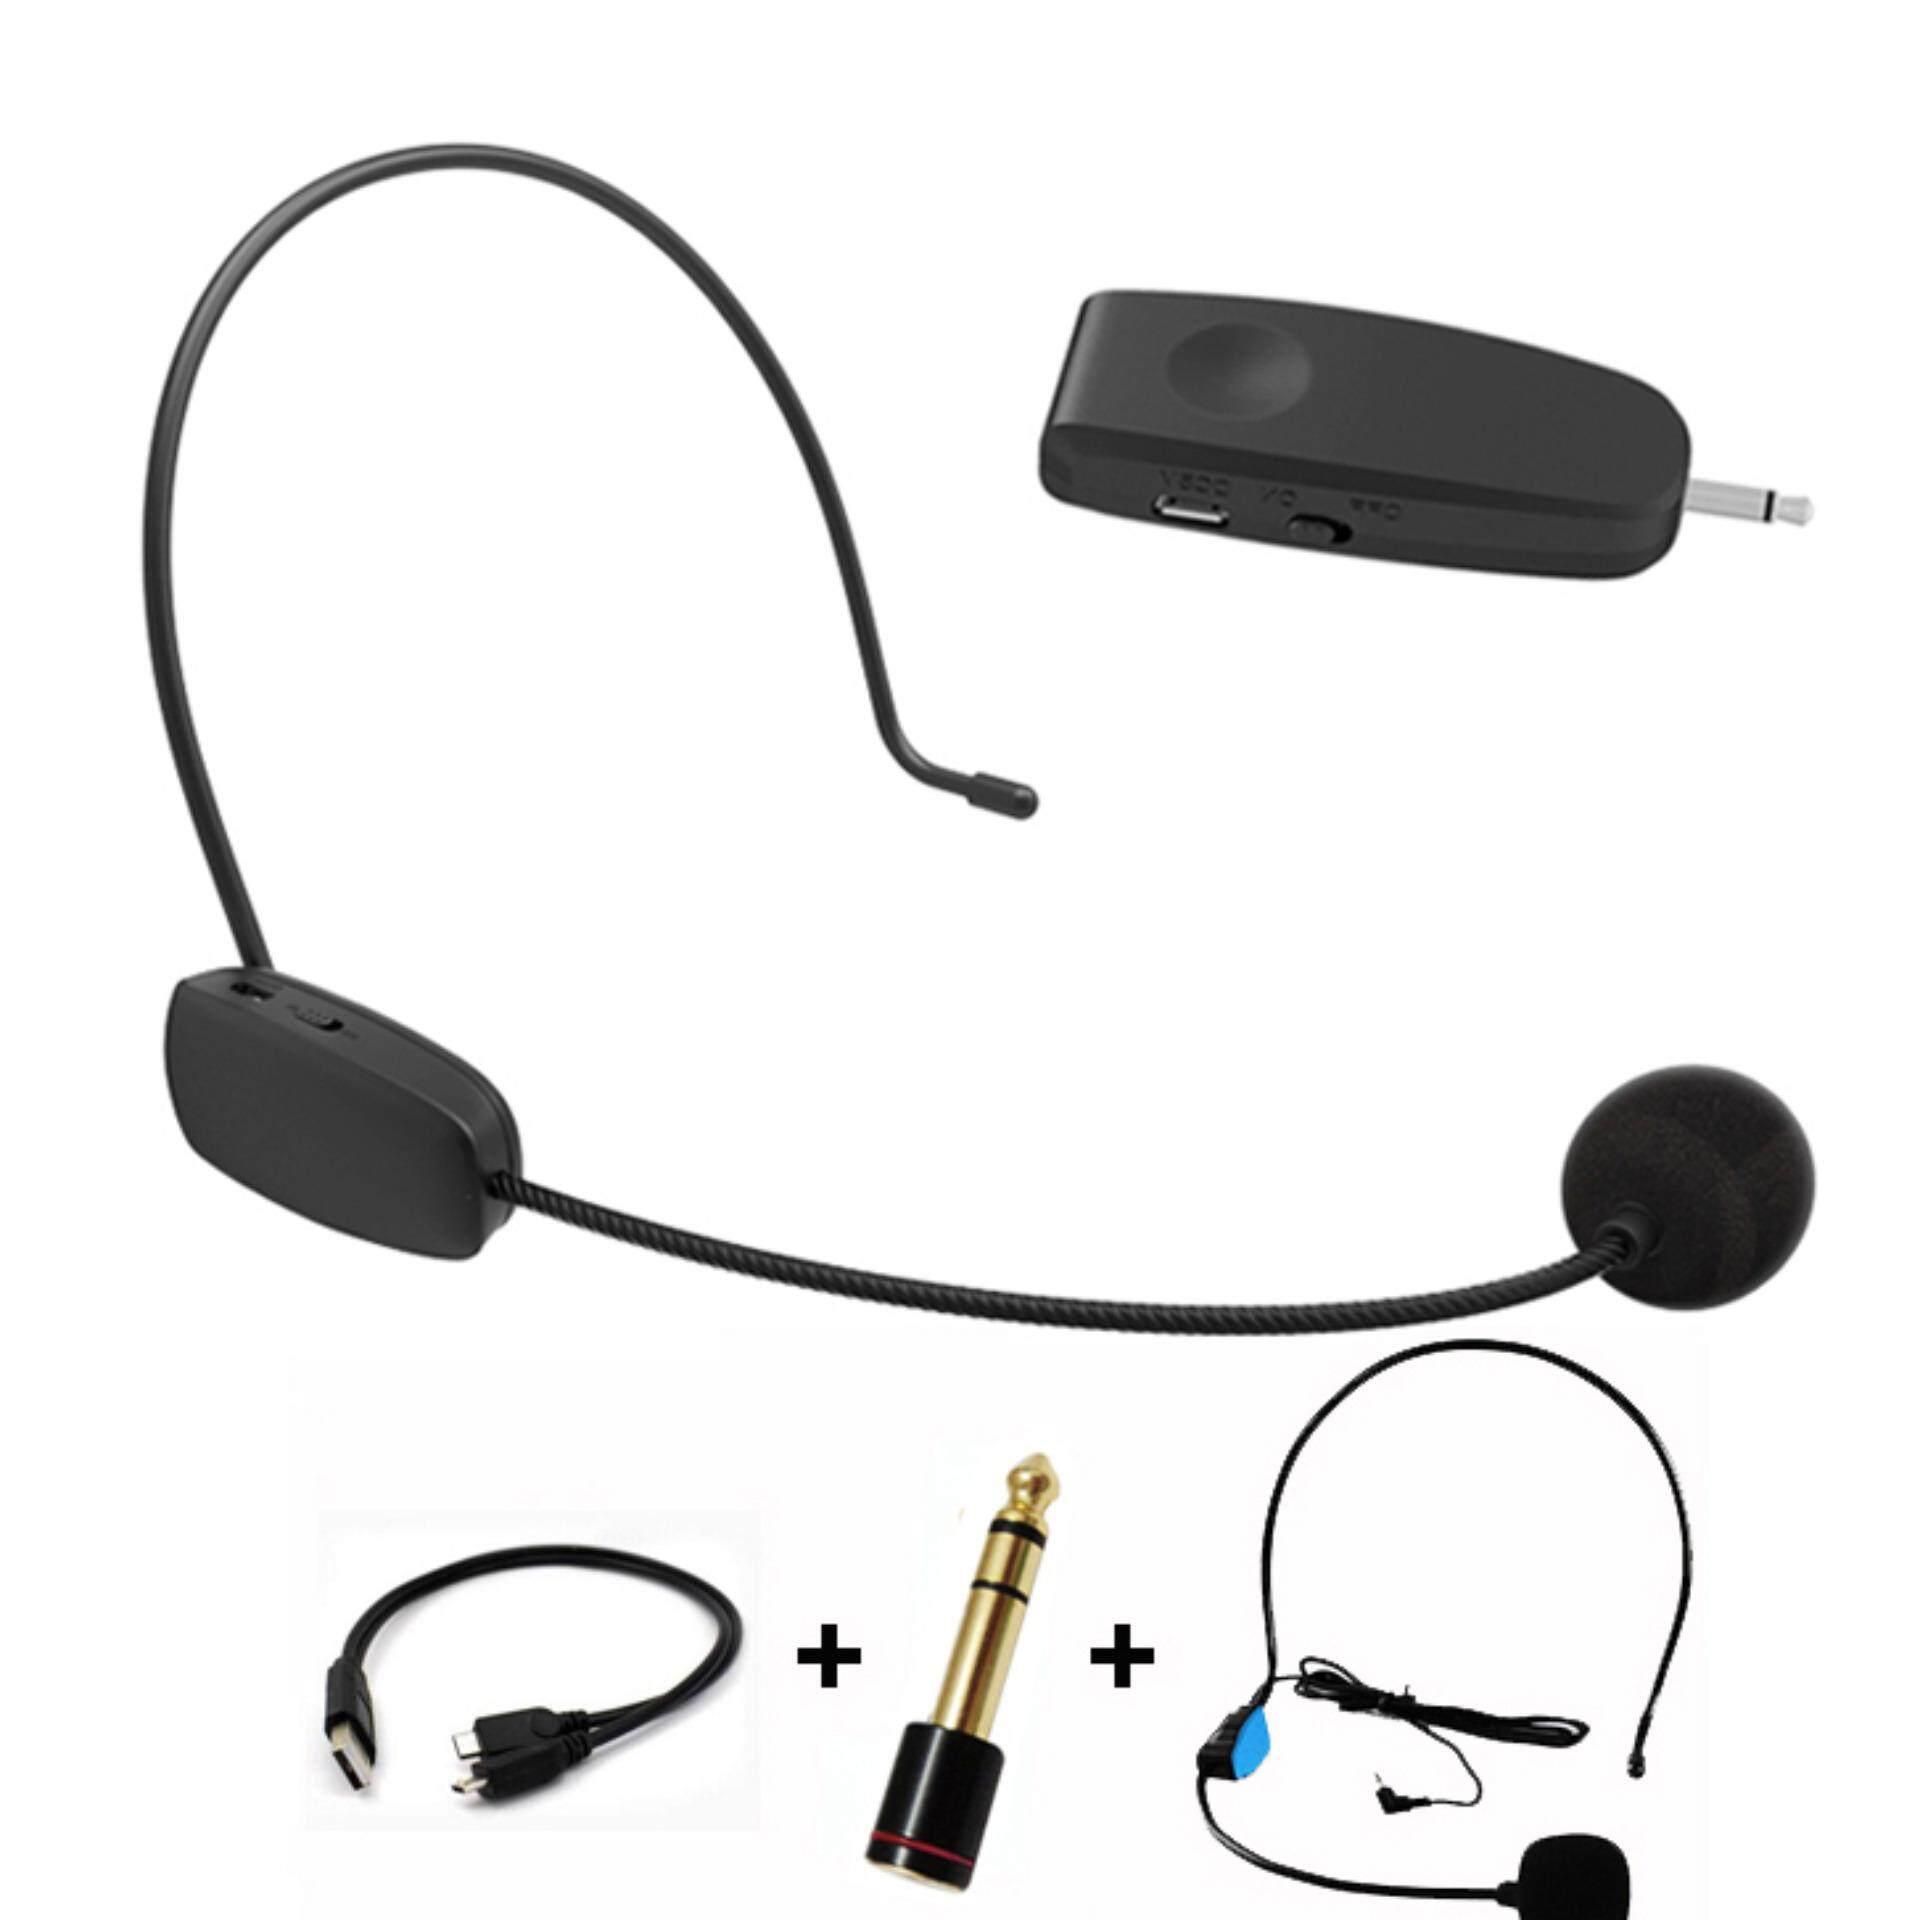 THB 1 265 2 4G Wireless Microphone Speech Headset Megaphone Radio Mic